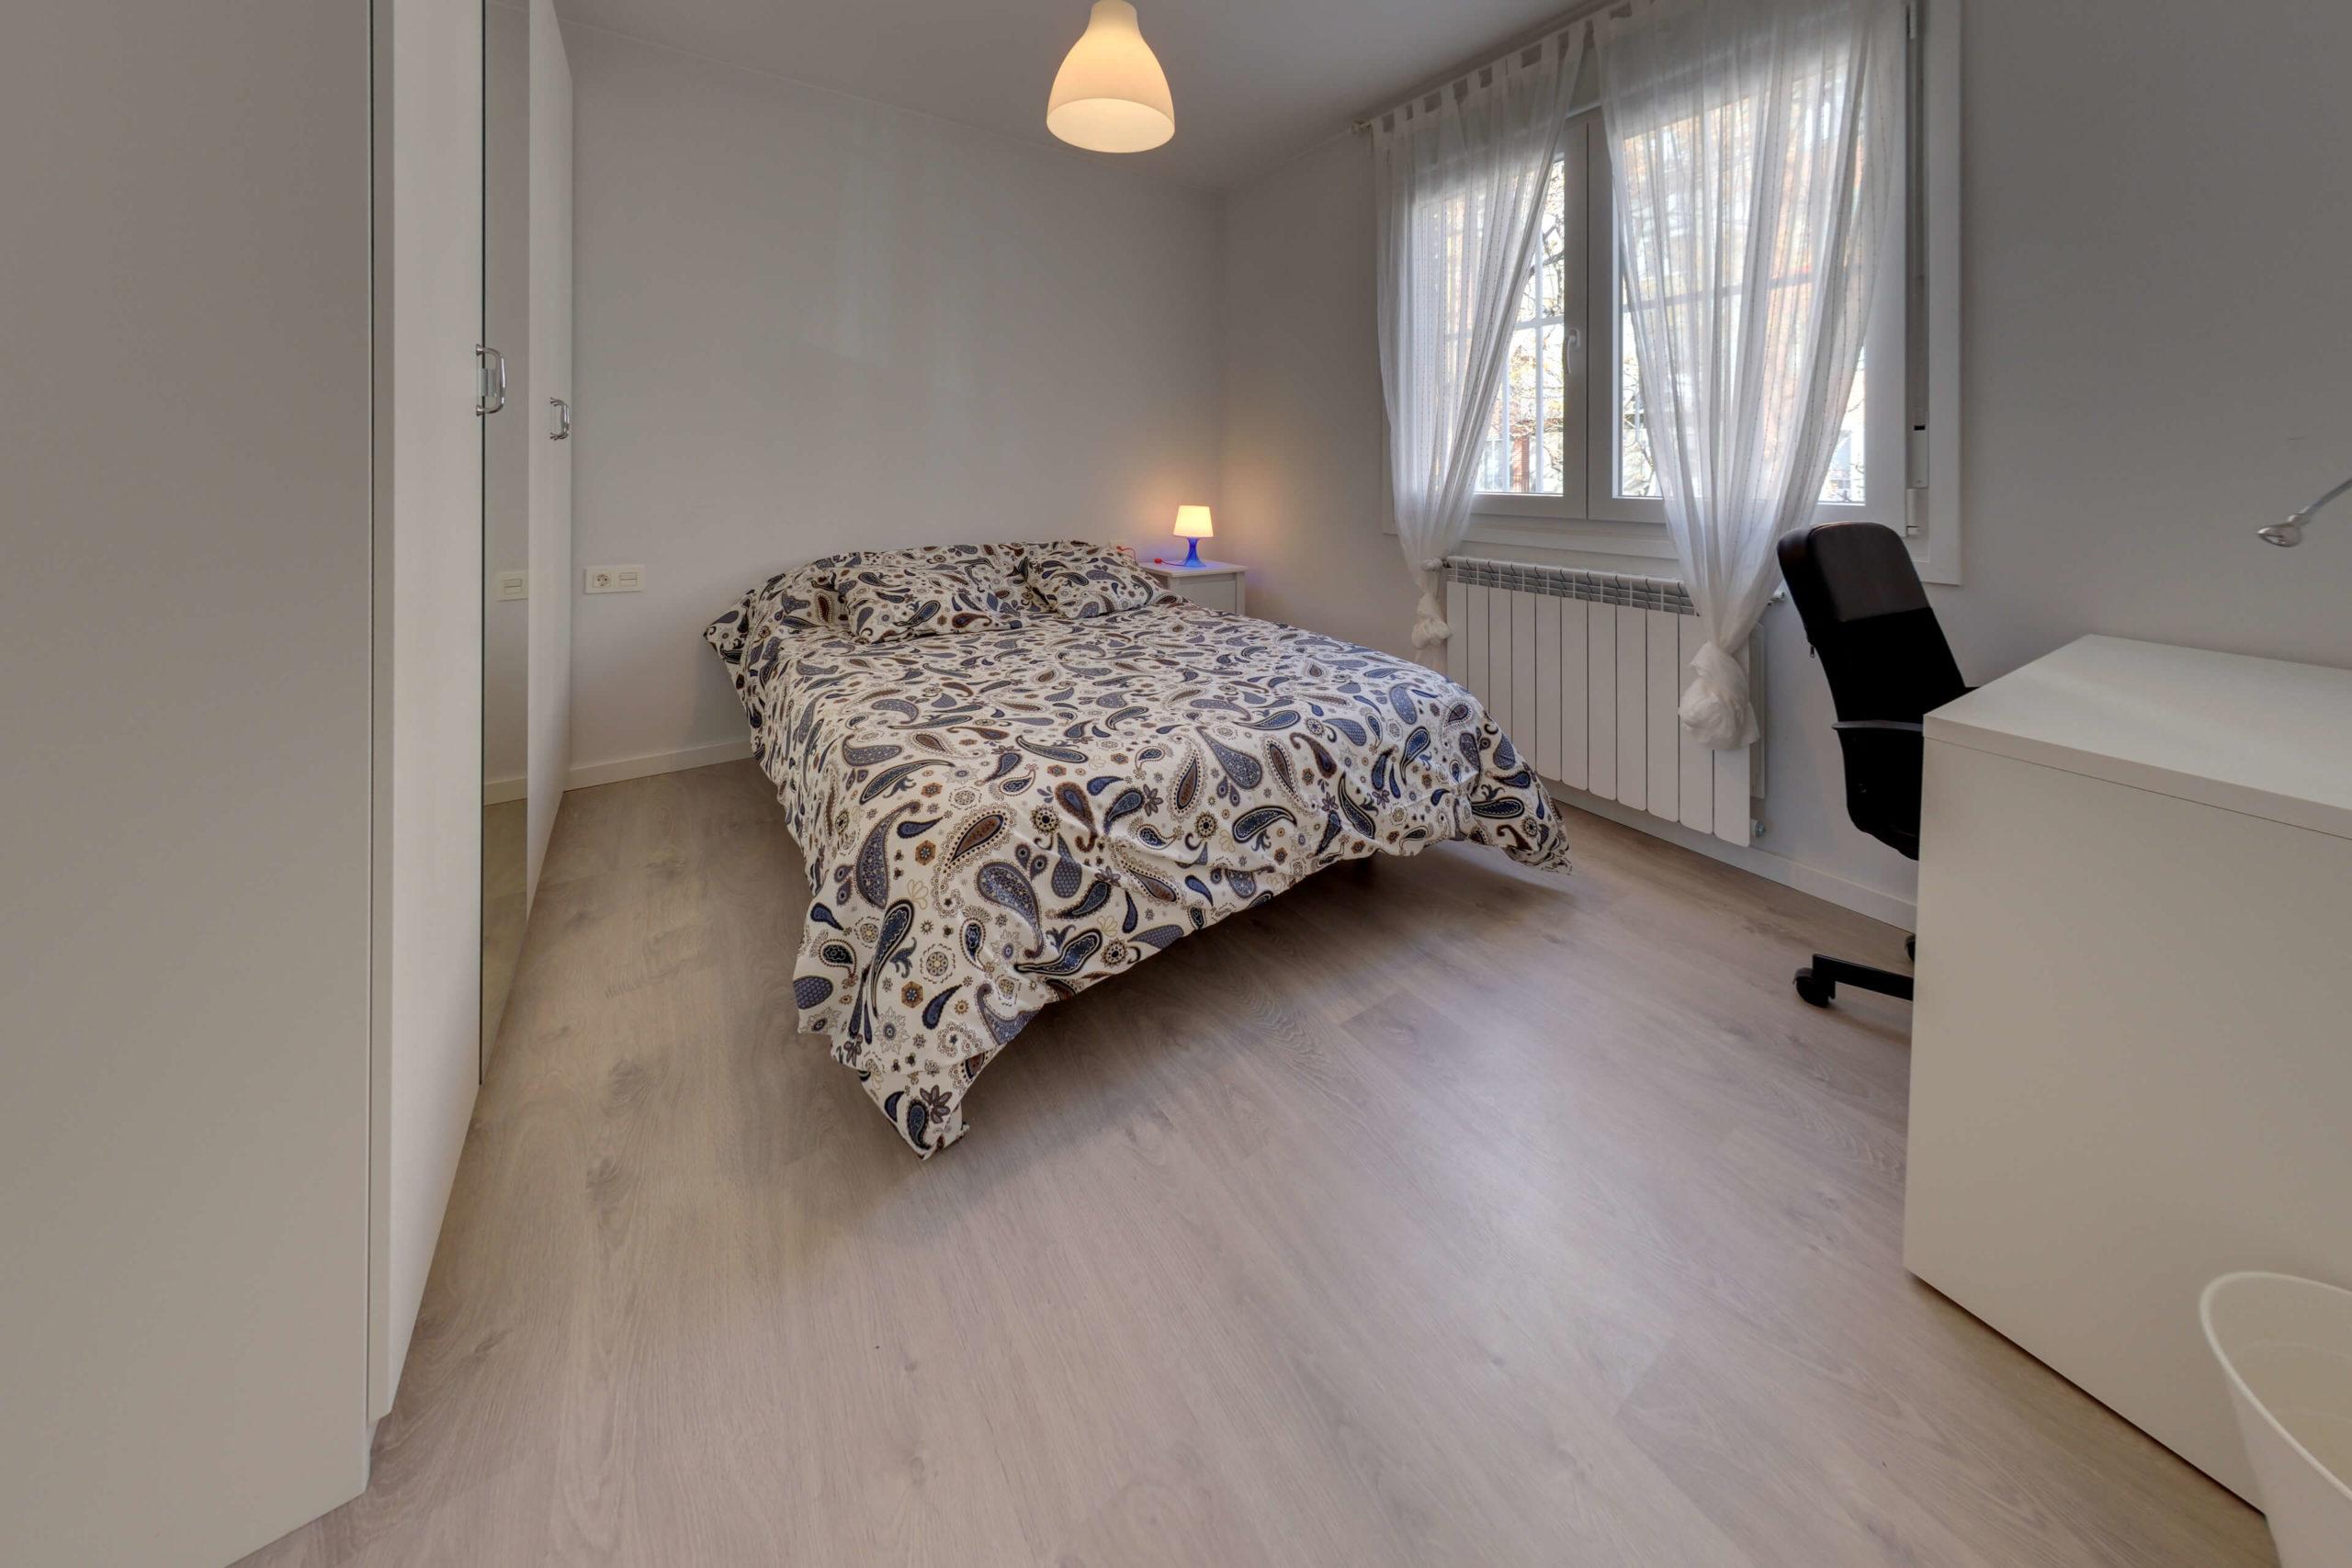 habitacion renovada alquiler piso compartido zaragoza